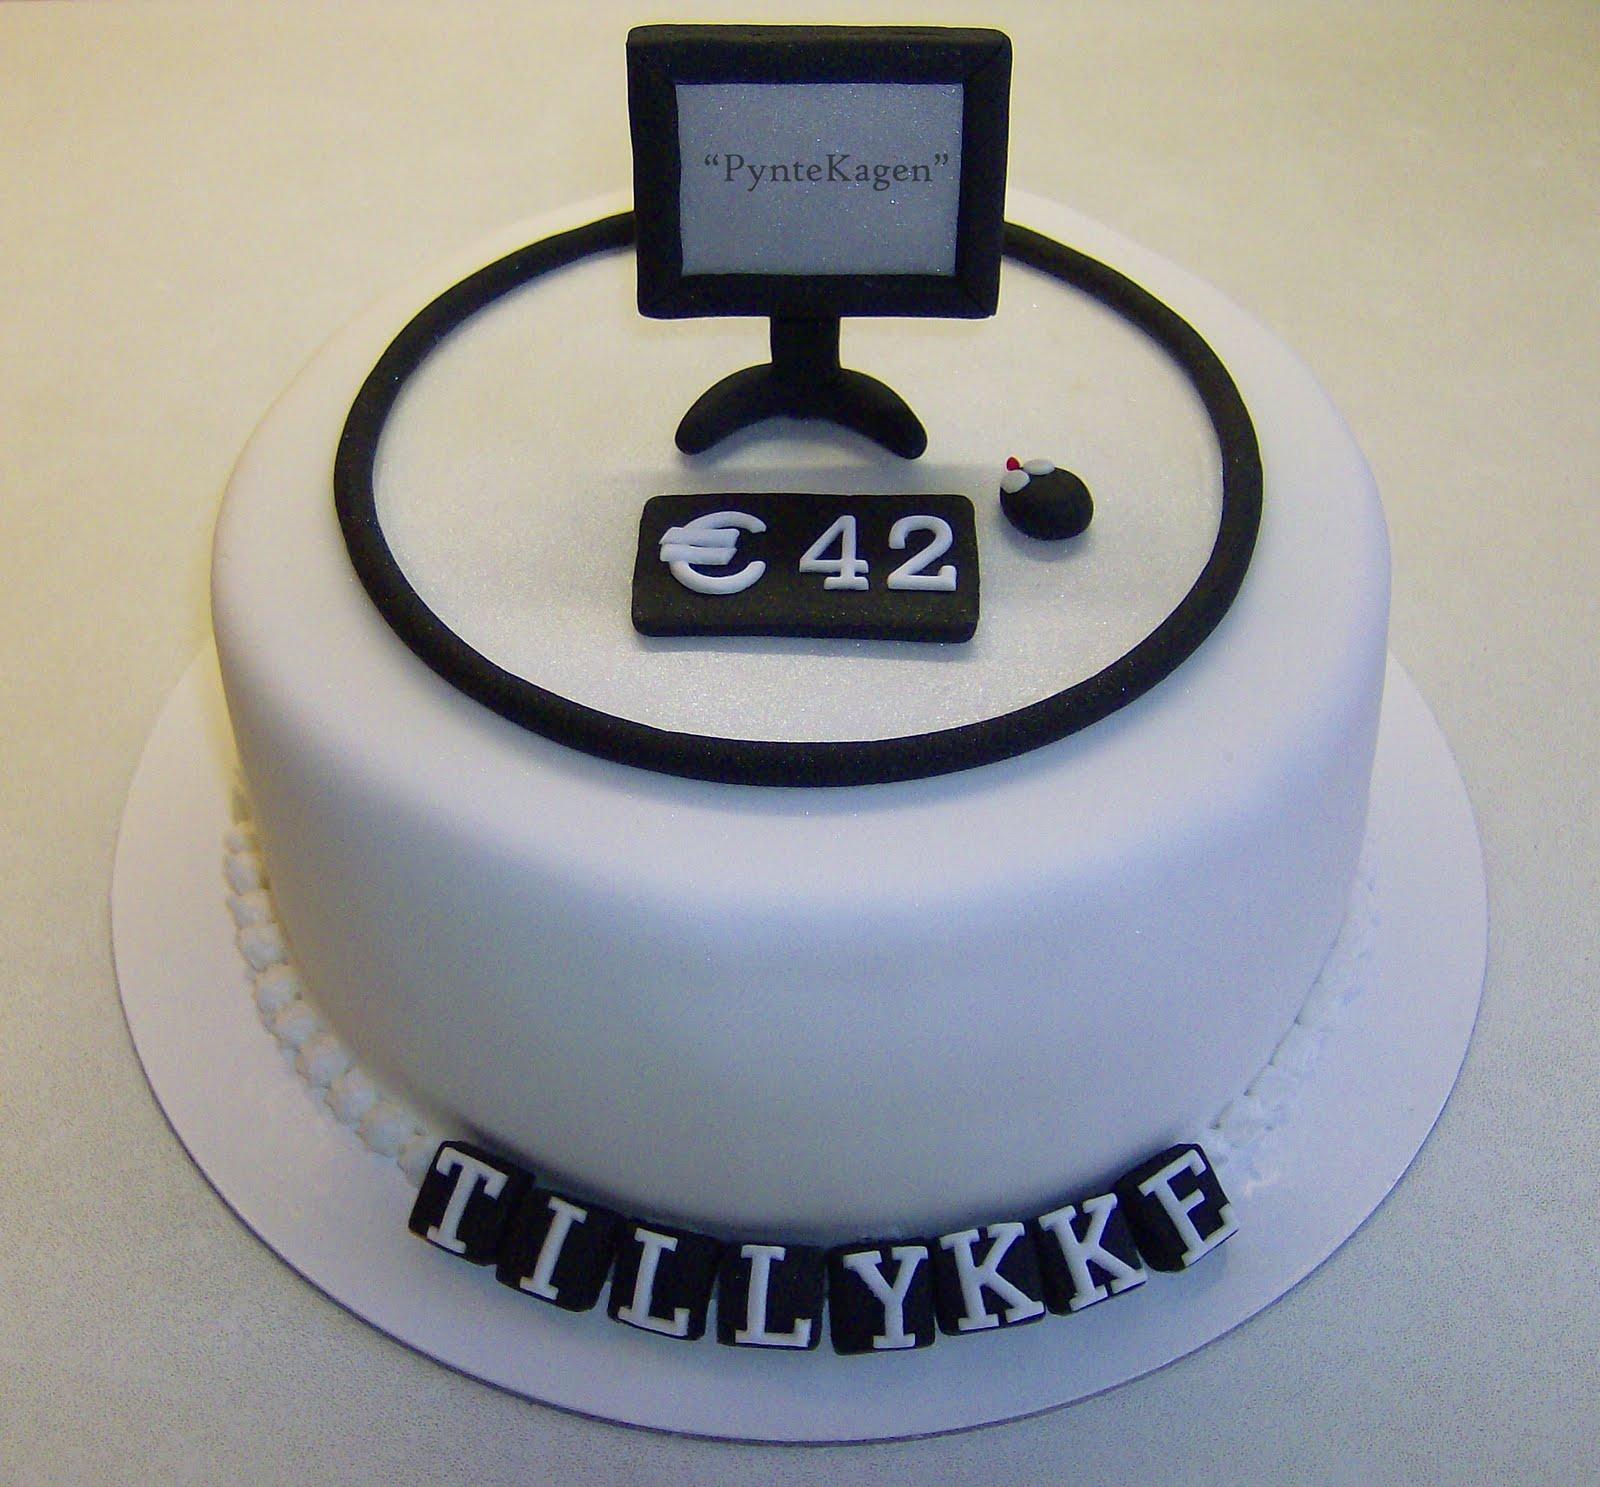 Computer kage